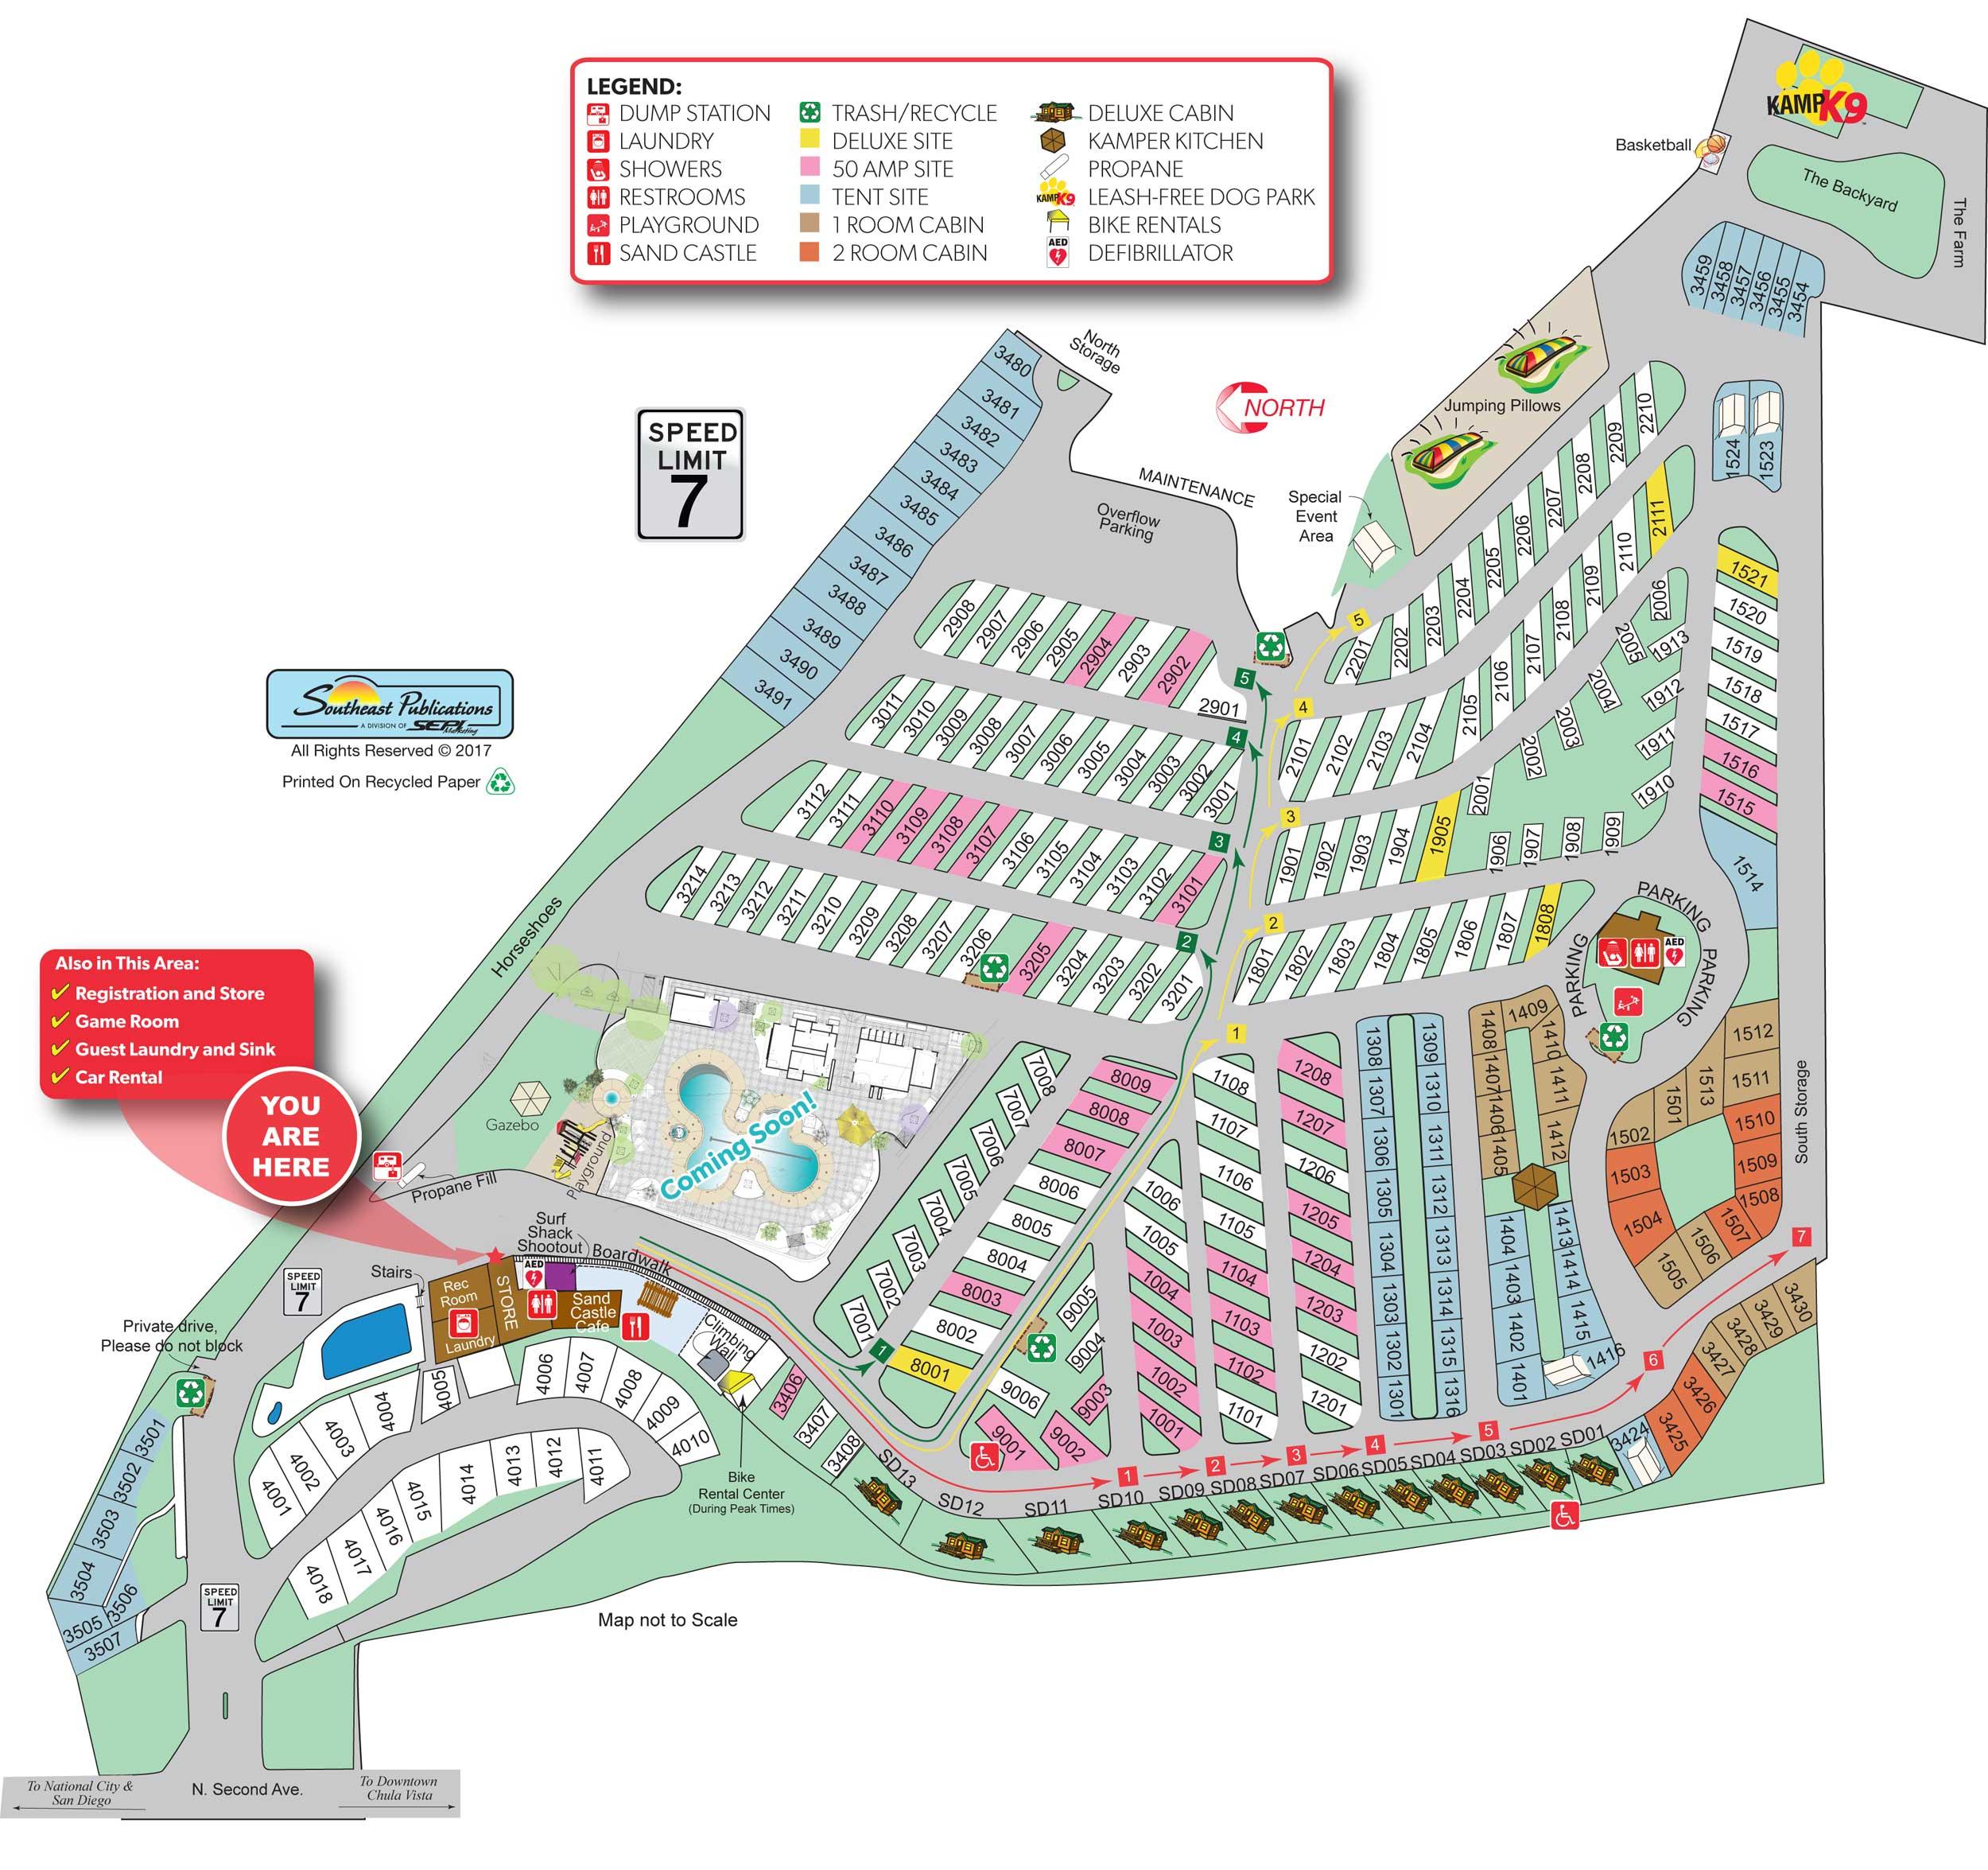 Chula Vista, California Campground   San Diego Metro Koa - Southern California Campgrounds Map